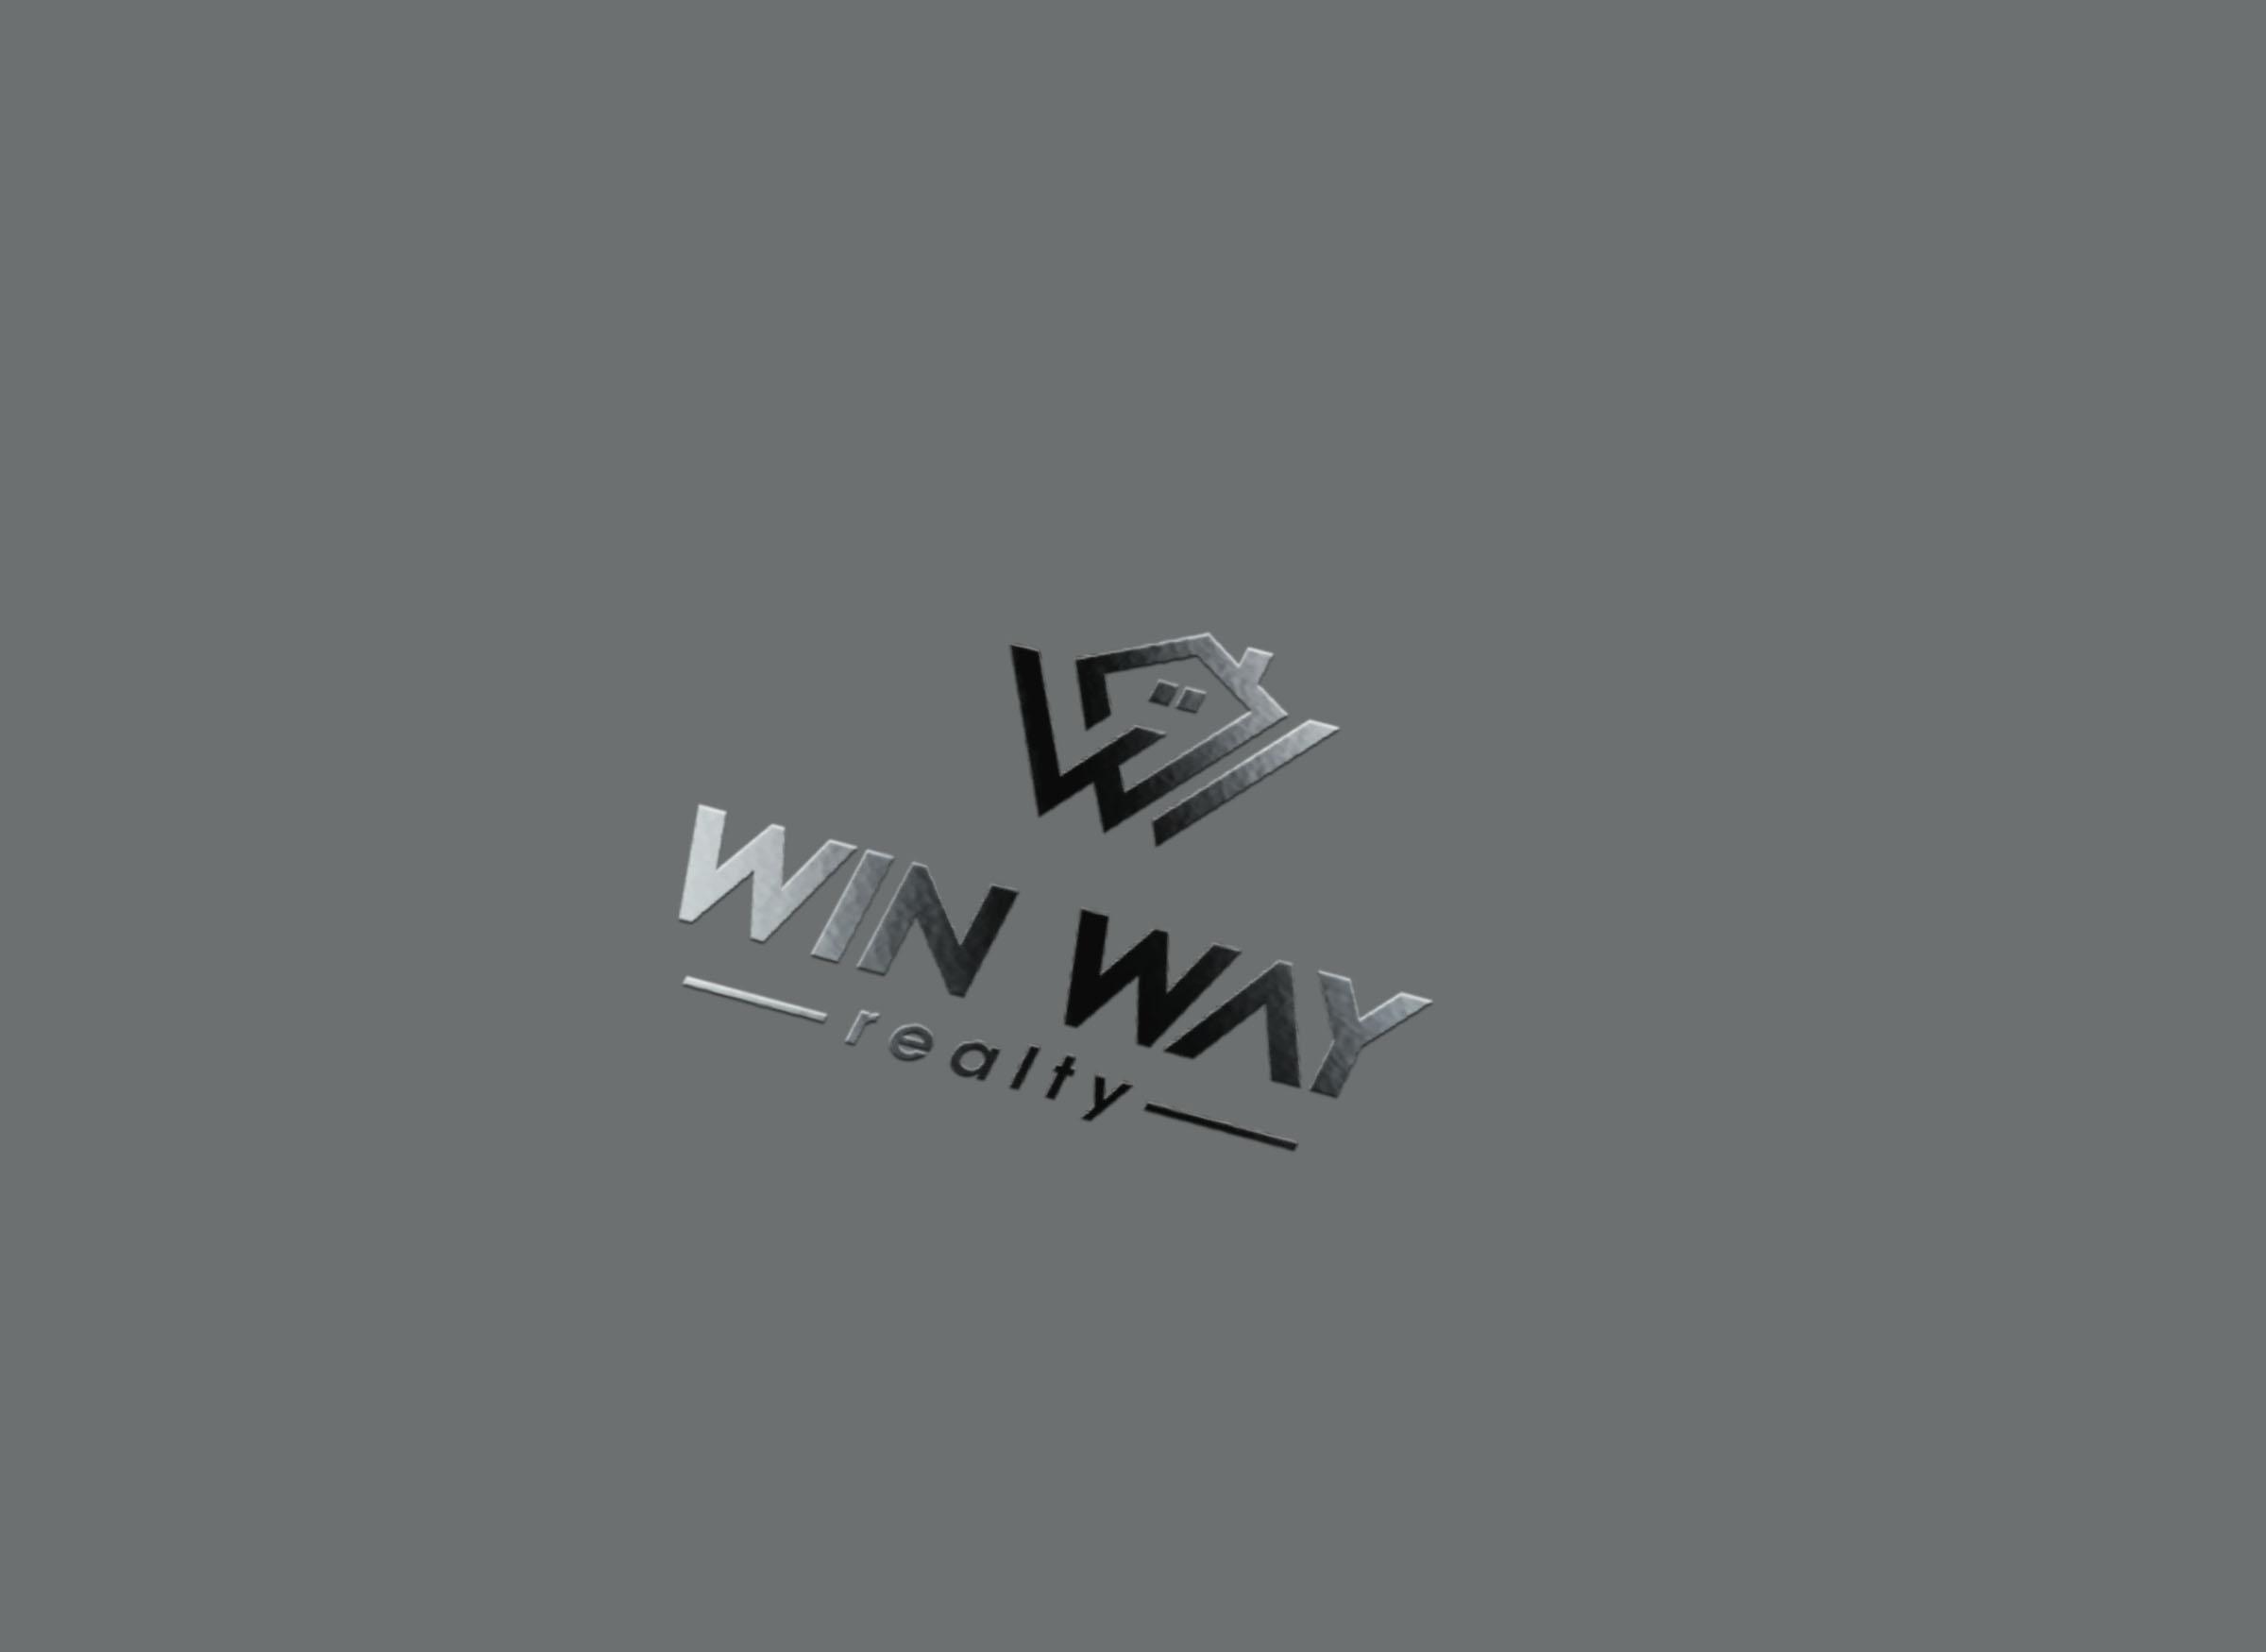 Логотип для агентства недвижимости фото f_3015aace2ef3ecaf.jpg